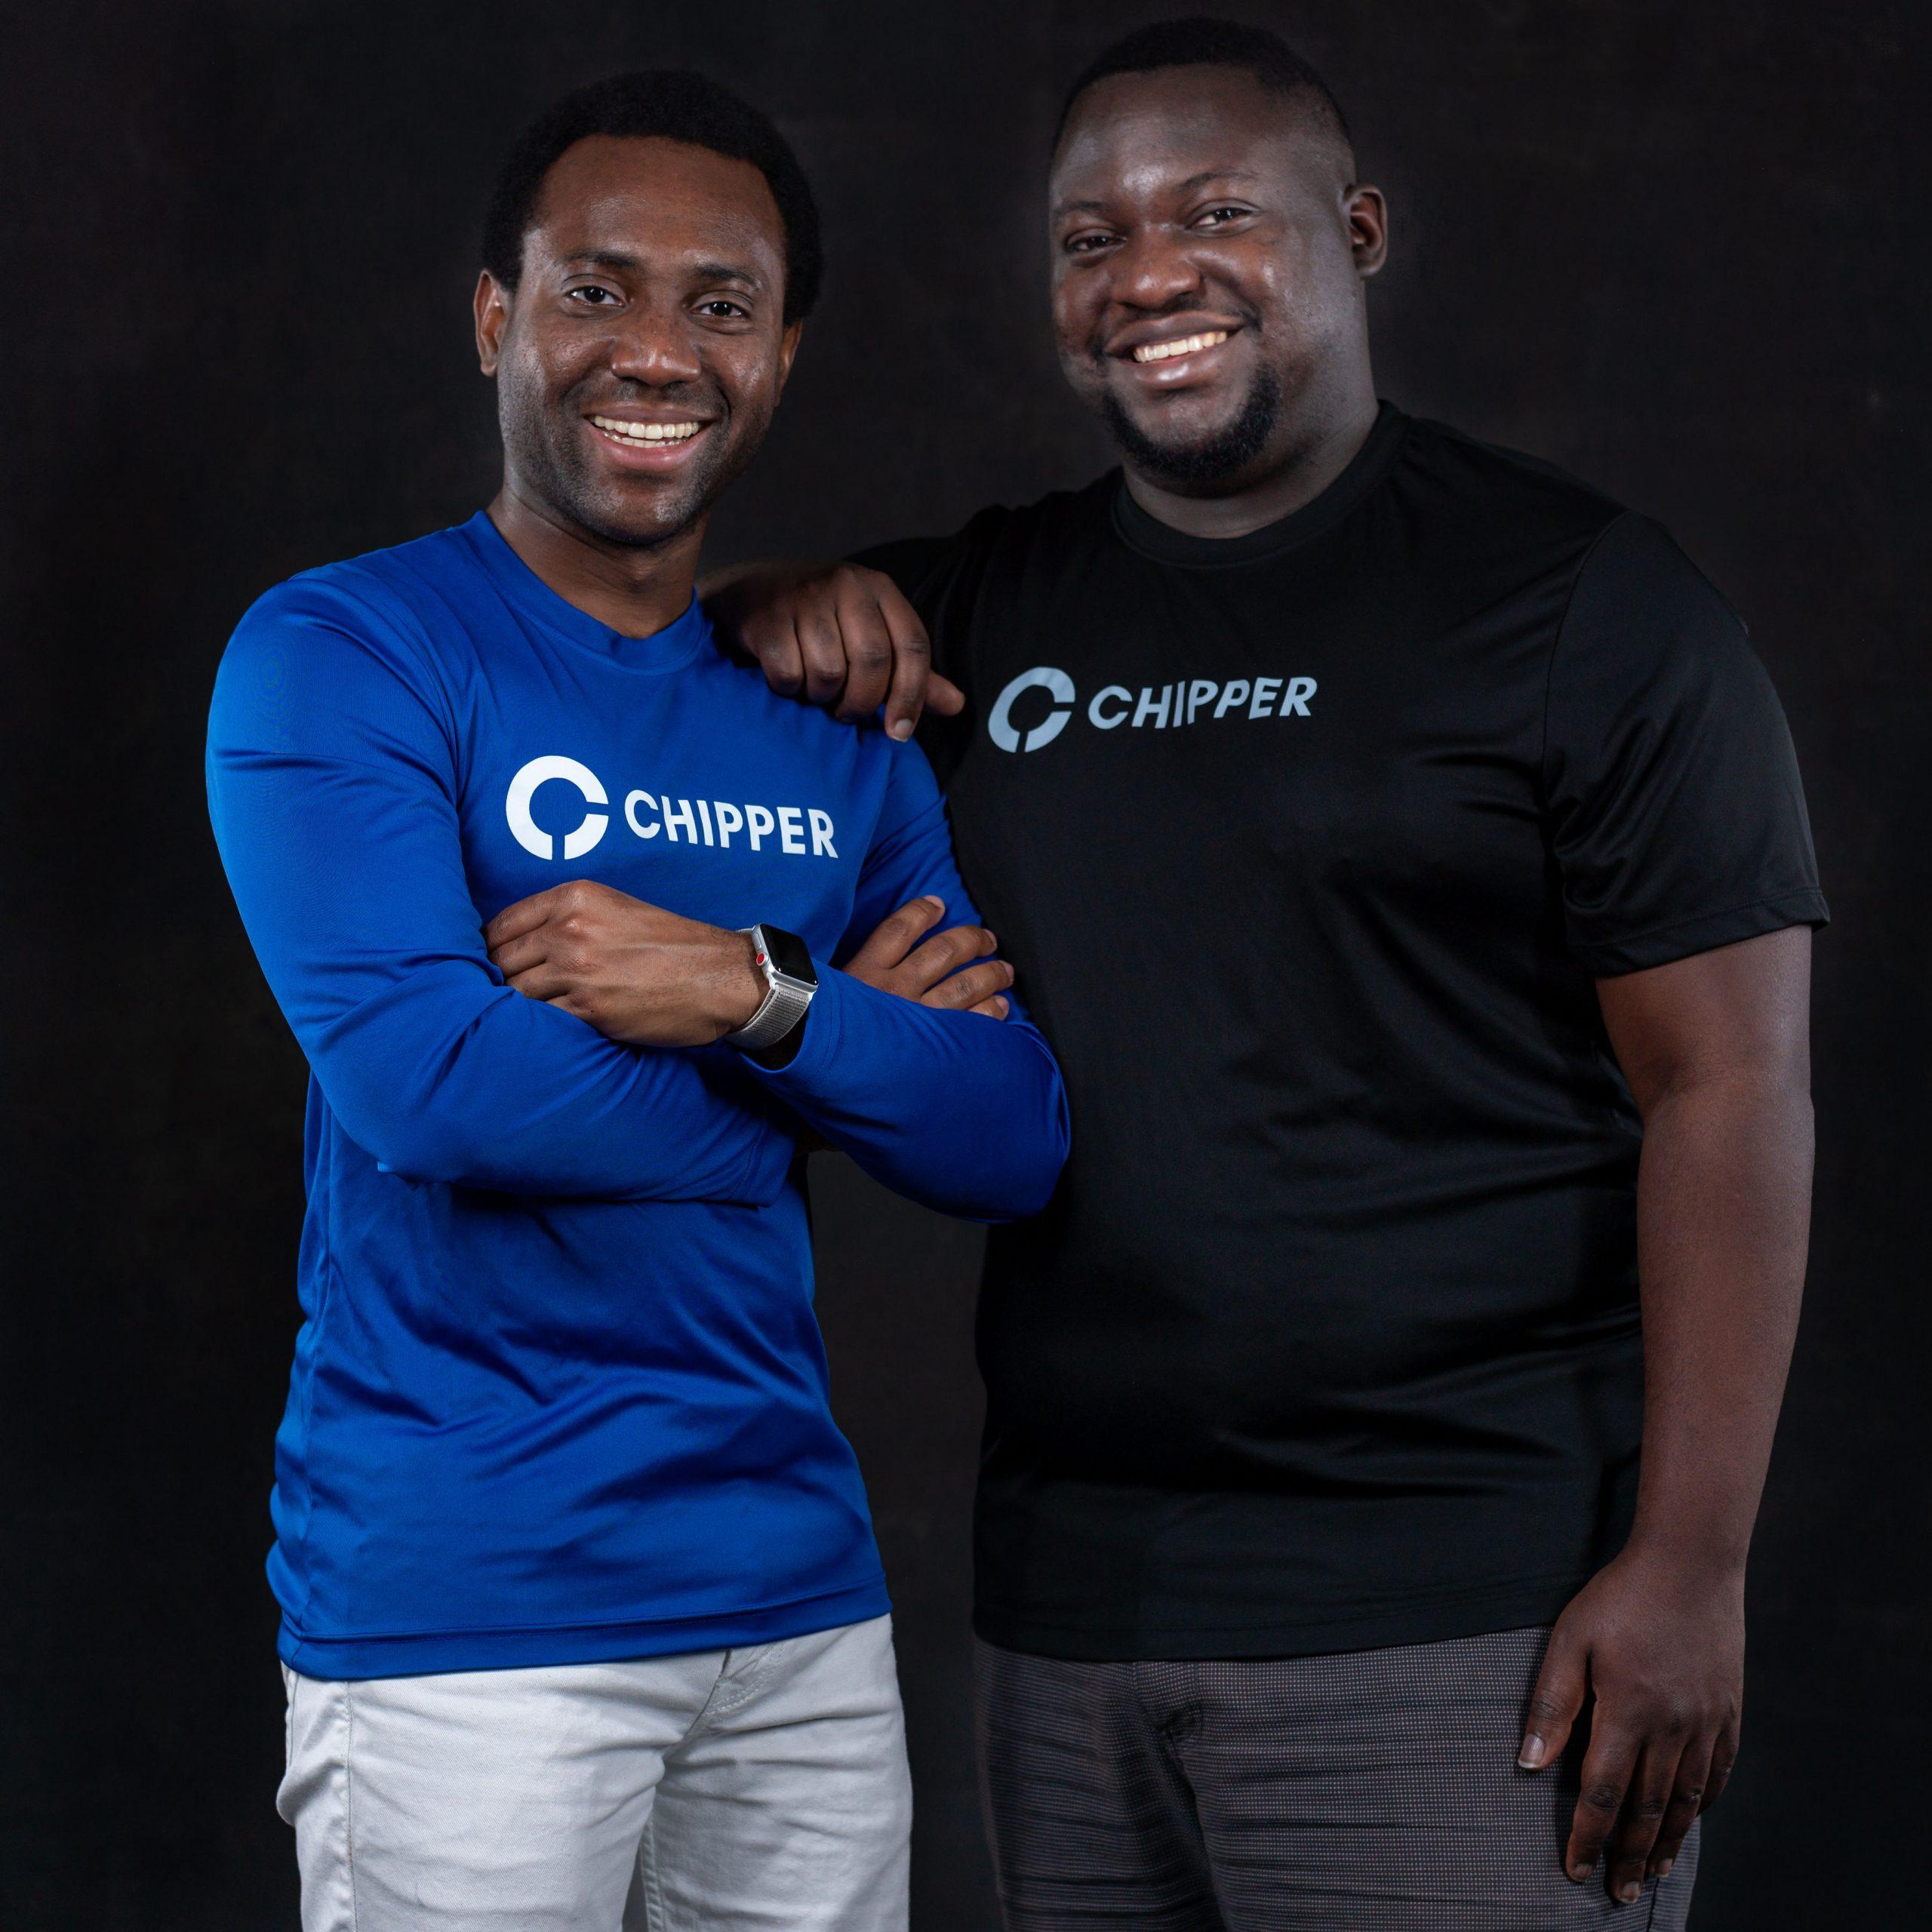 Chipper Cash App Founders